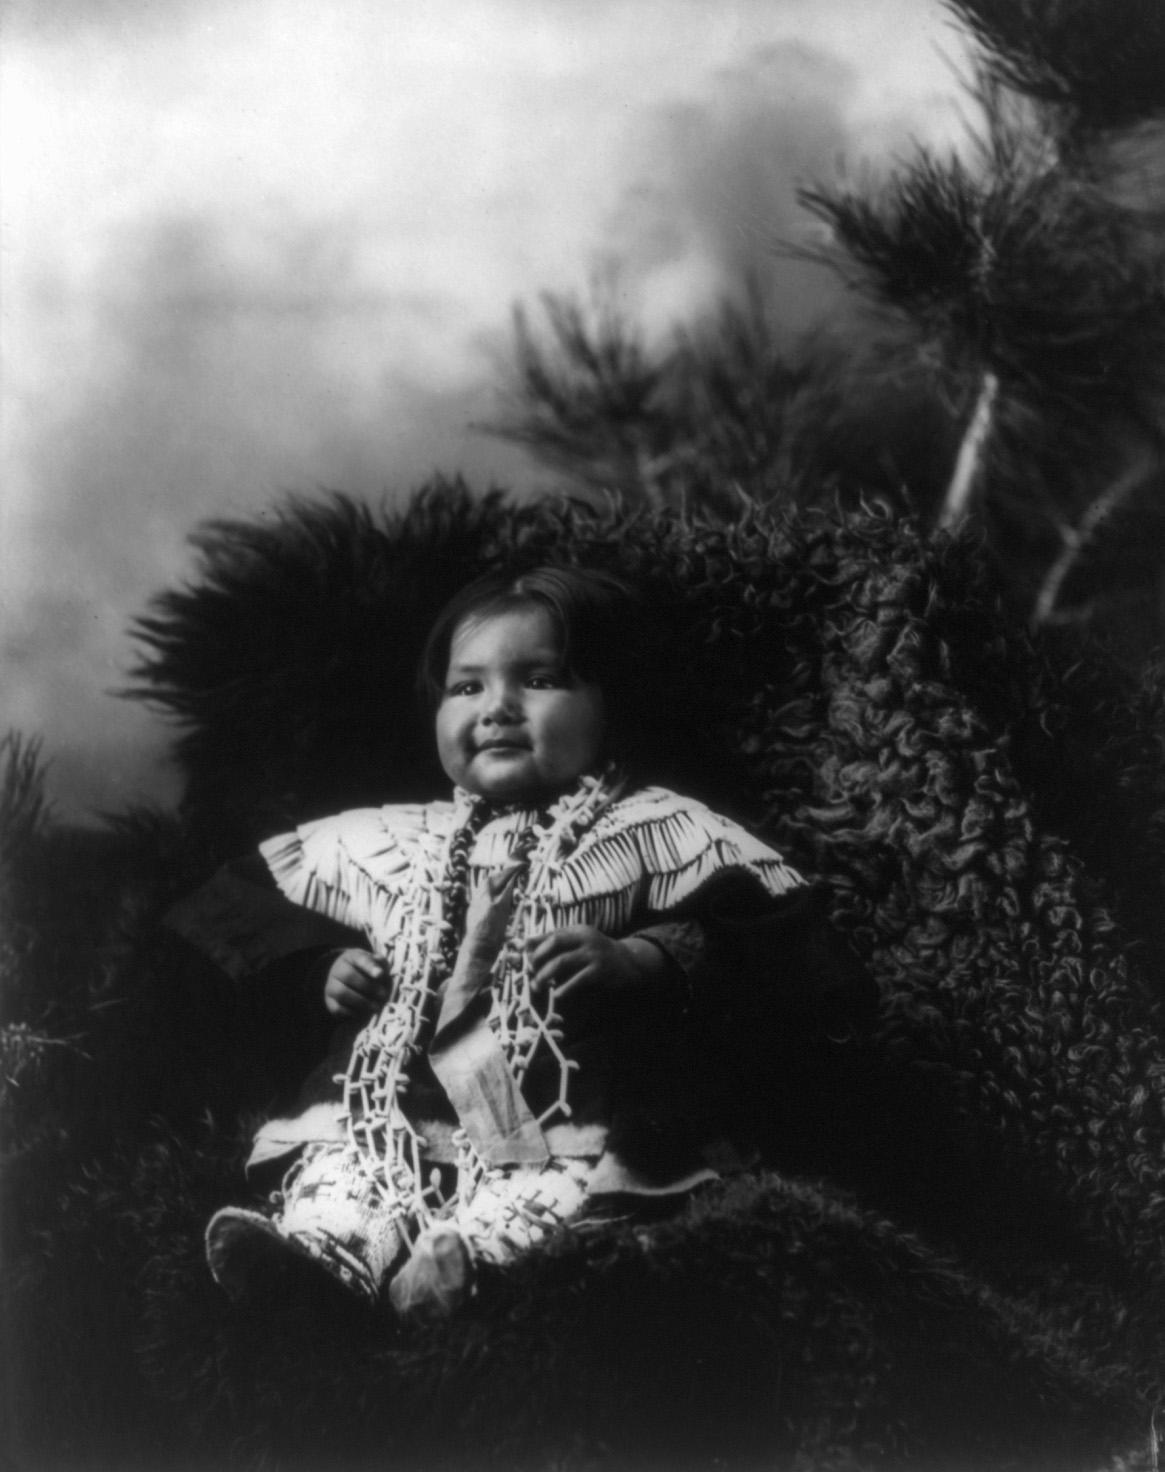 File:Two Shawl, Dakota Sioux girl, by Heyn & Matzen, 1900